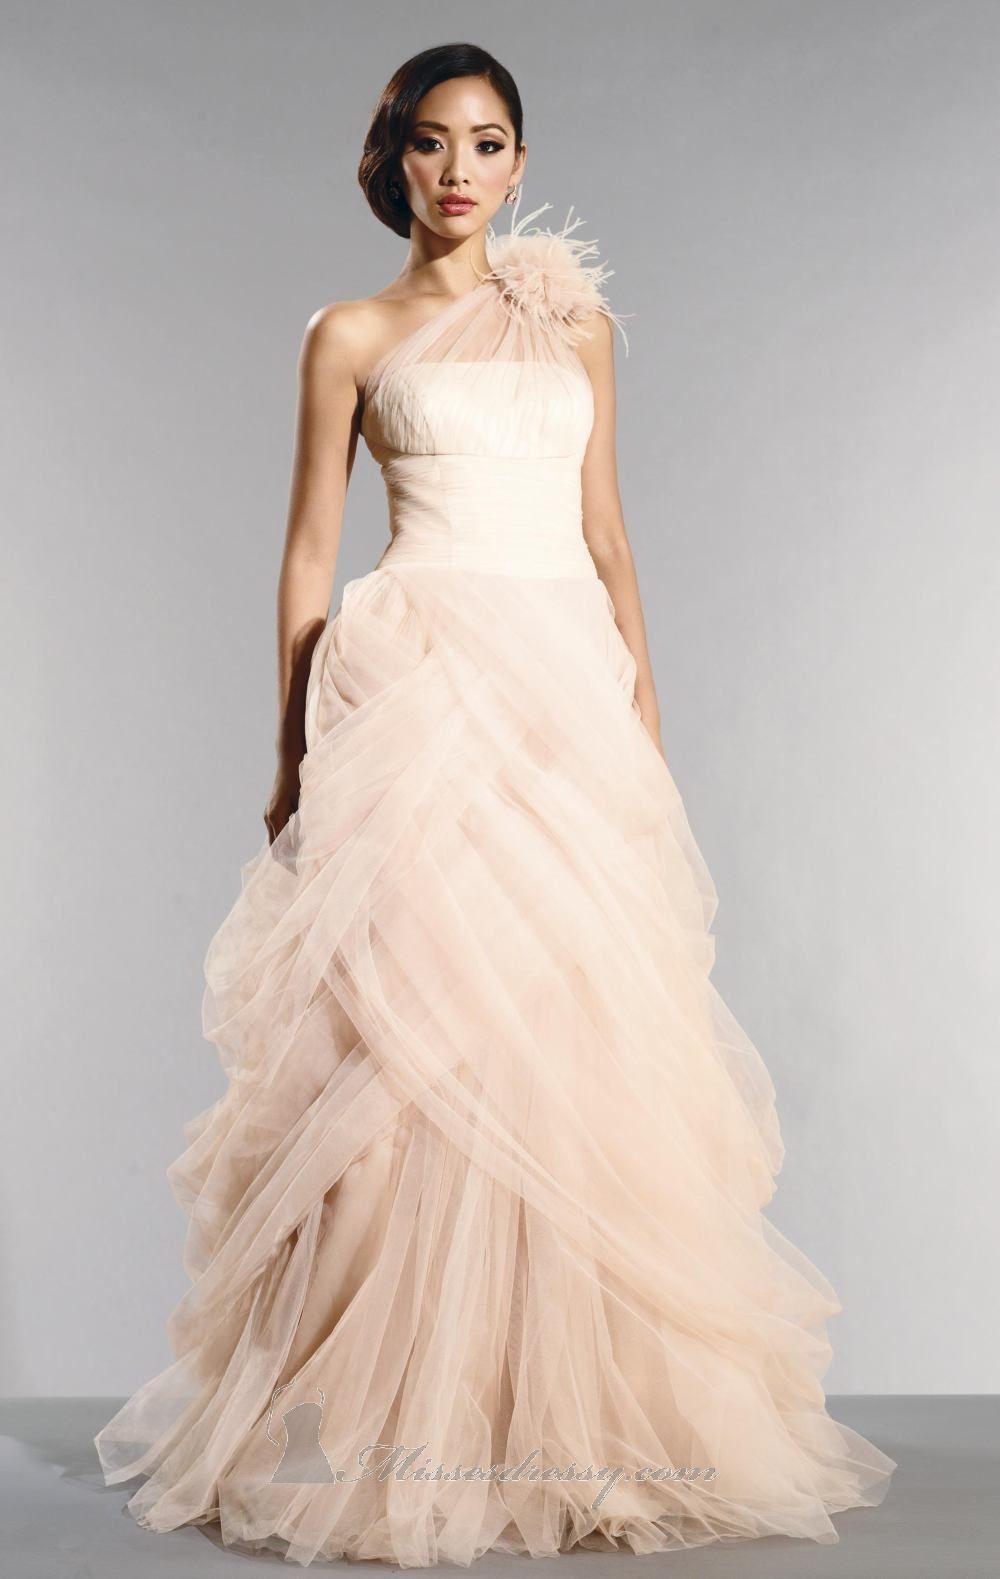 blush colored wedding dress Pink wedding dresses